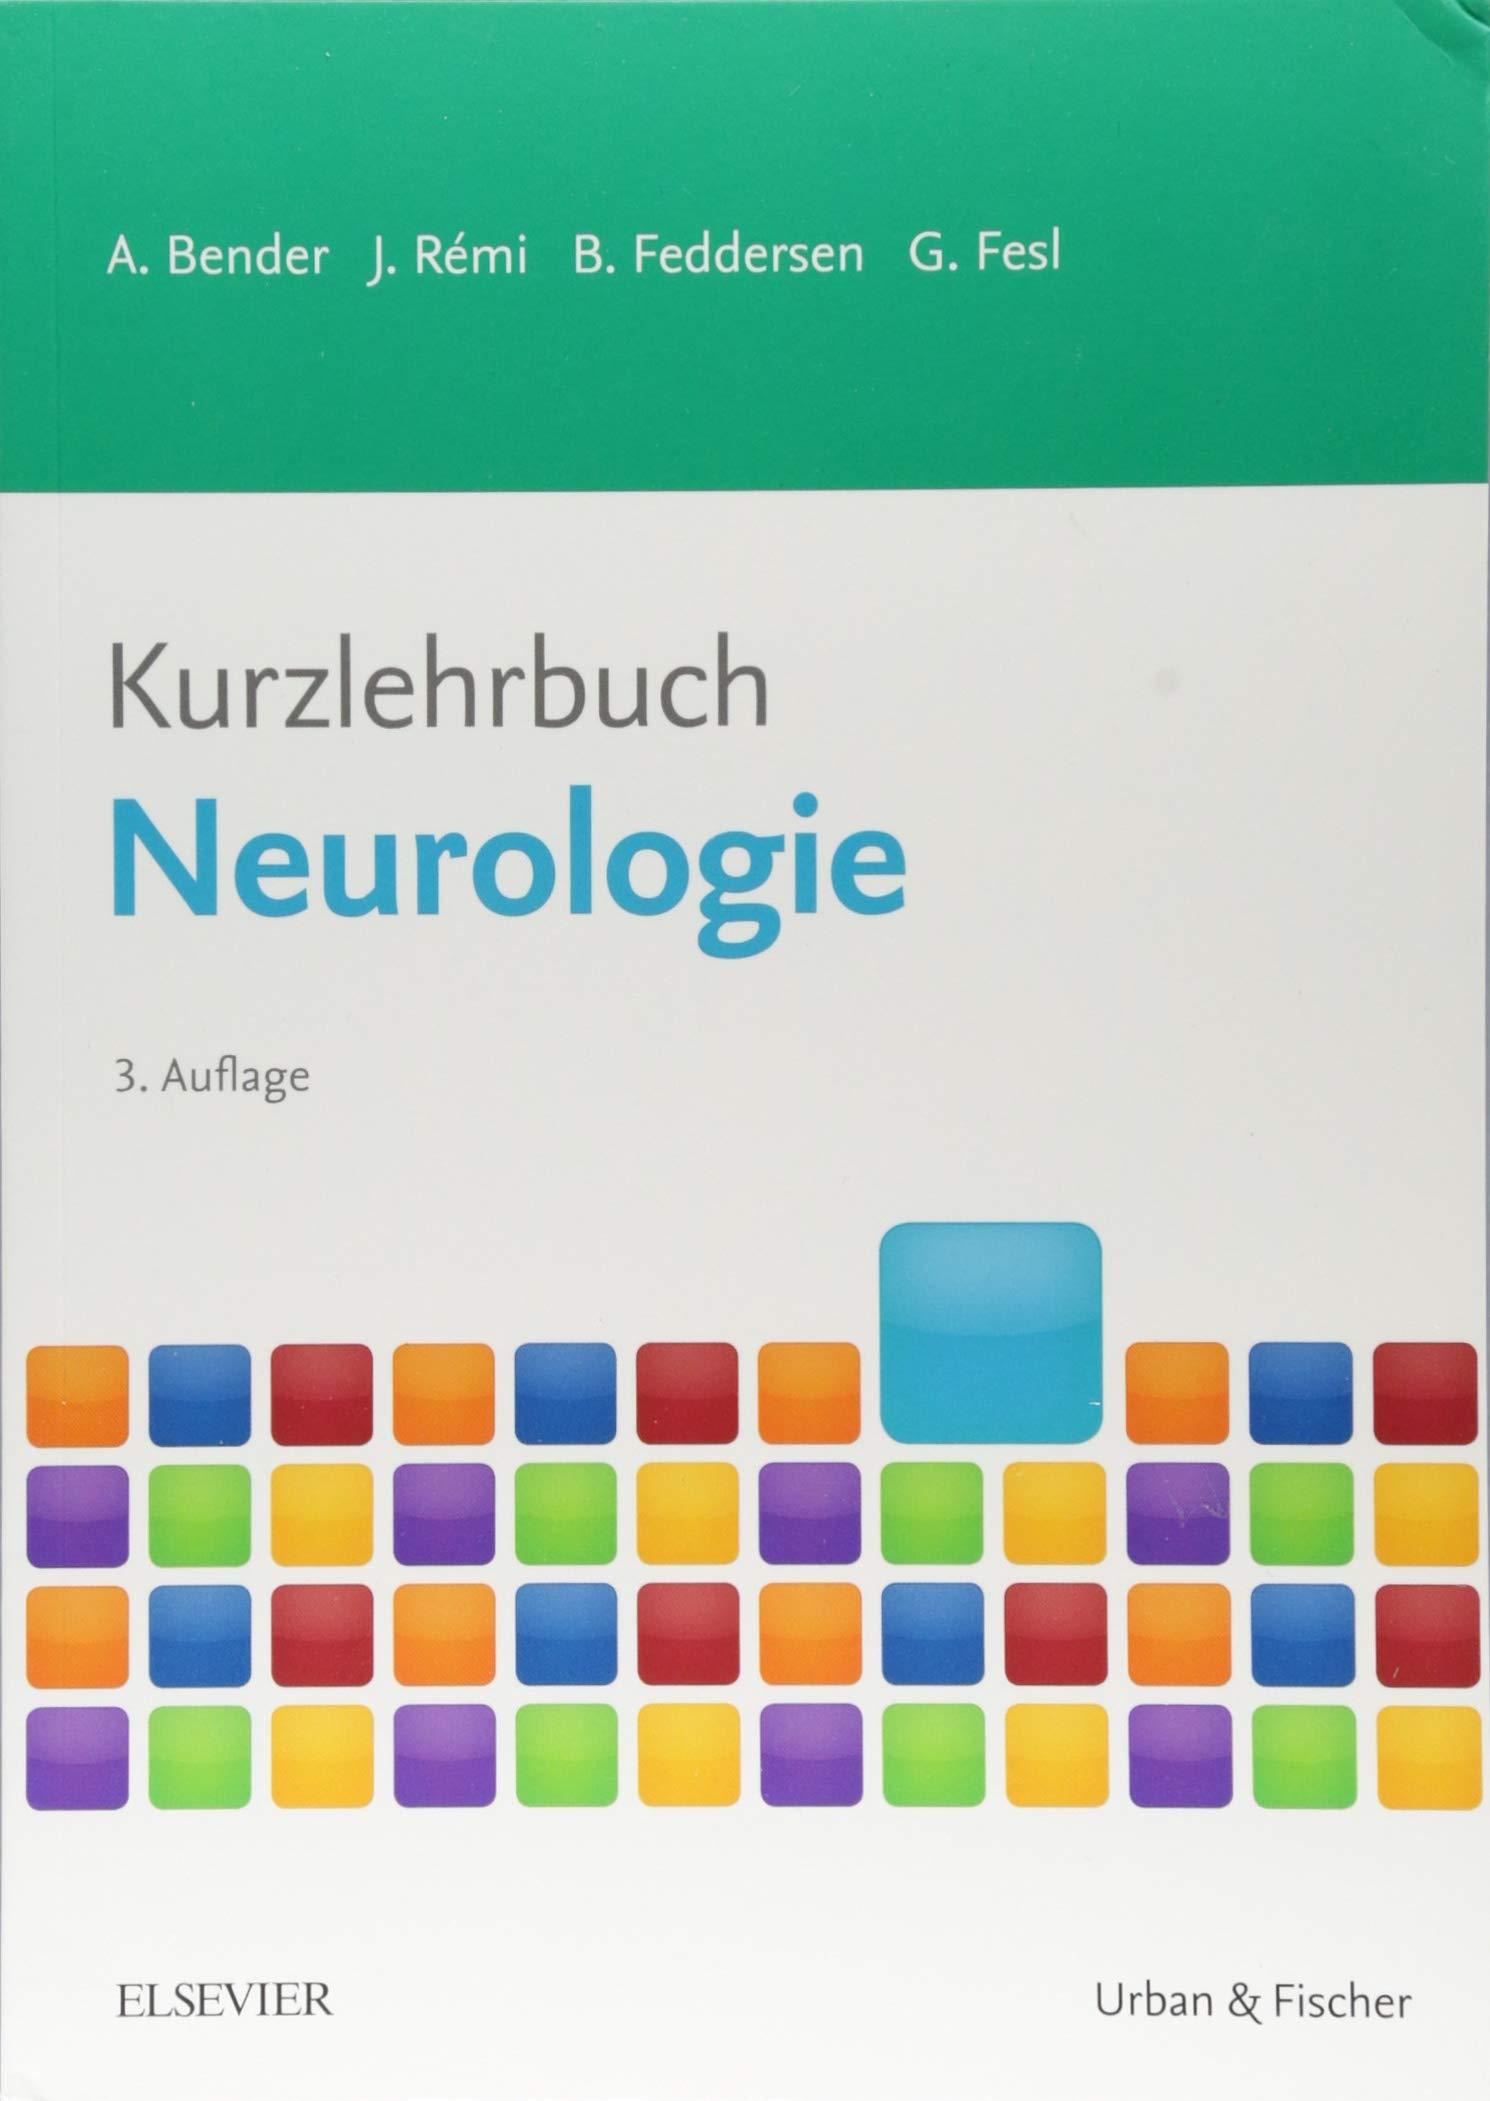 Kurzlehrbuch Neurologie (Kurzlehrbücher)